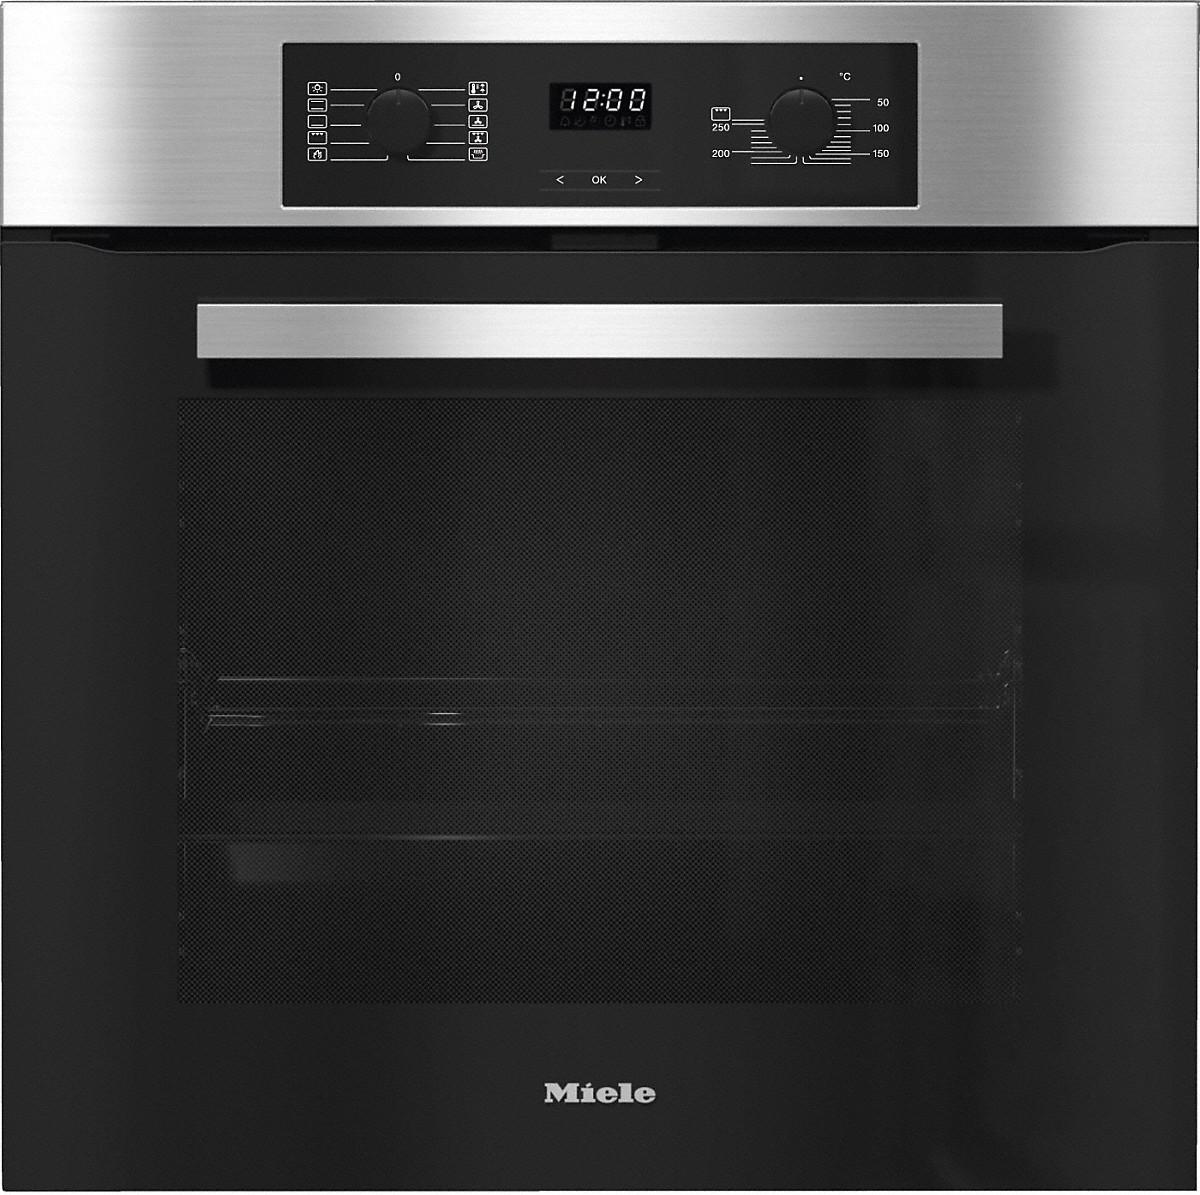 miele ovens h 2267 bp active oven rh miele co uk Miele Oven Miele Kitchen Appliances